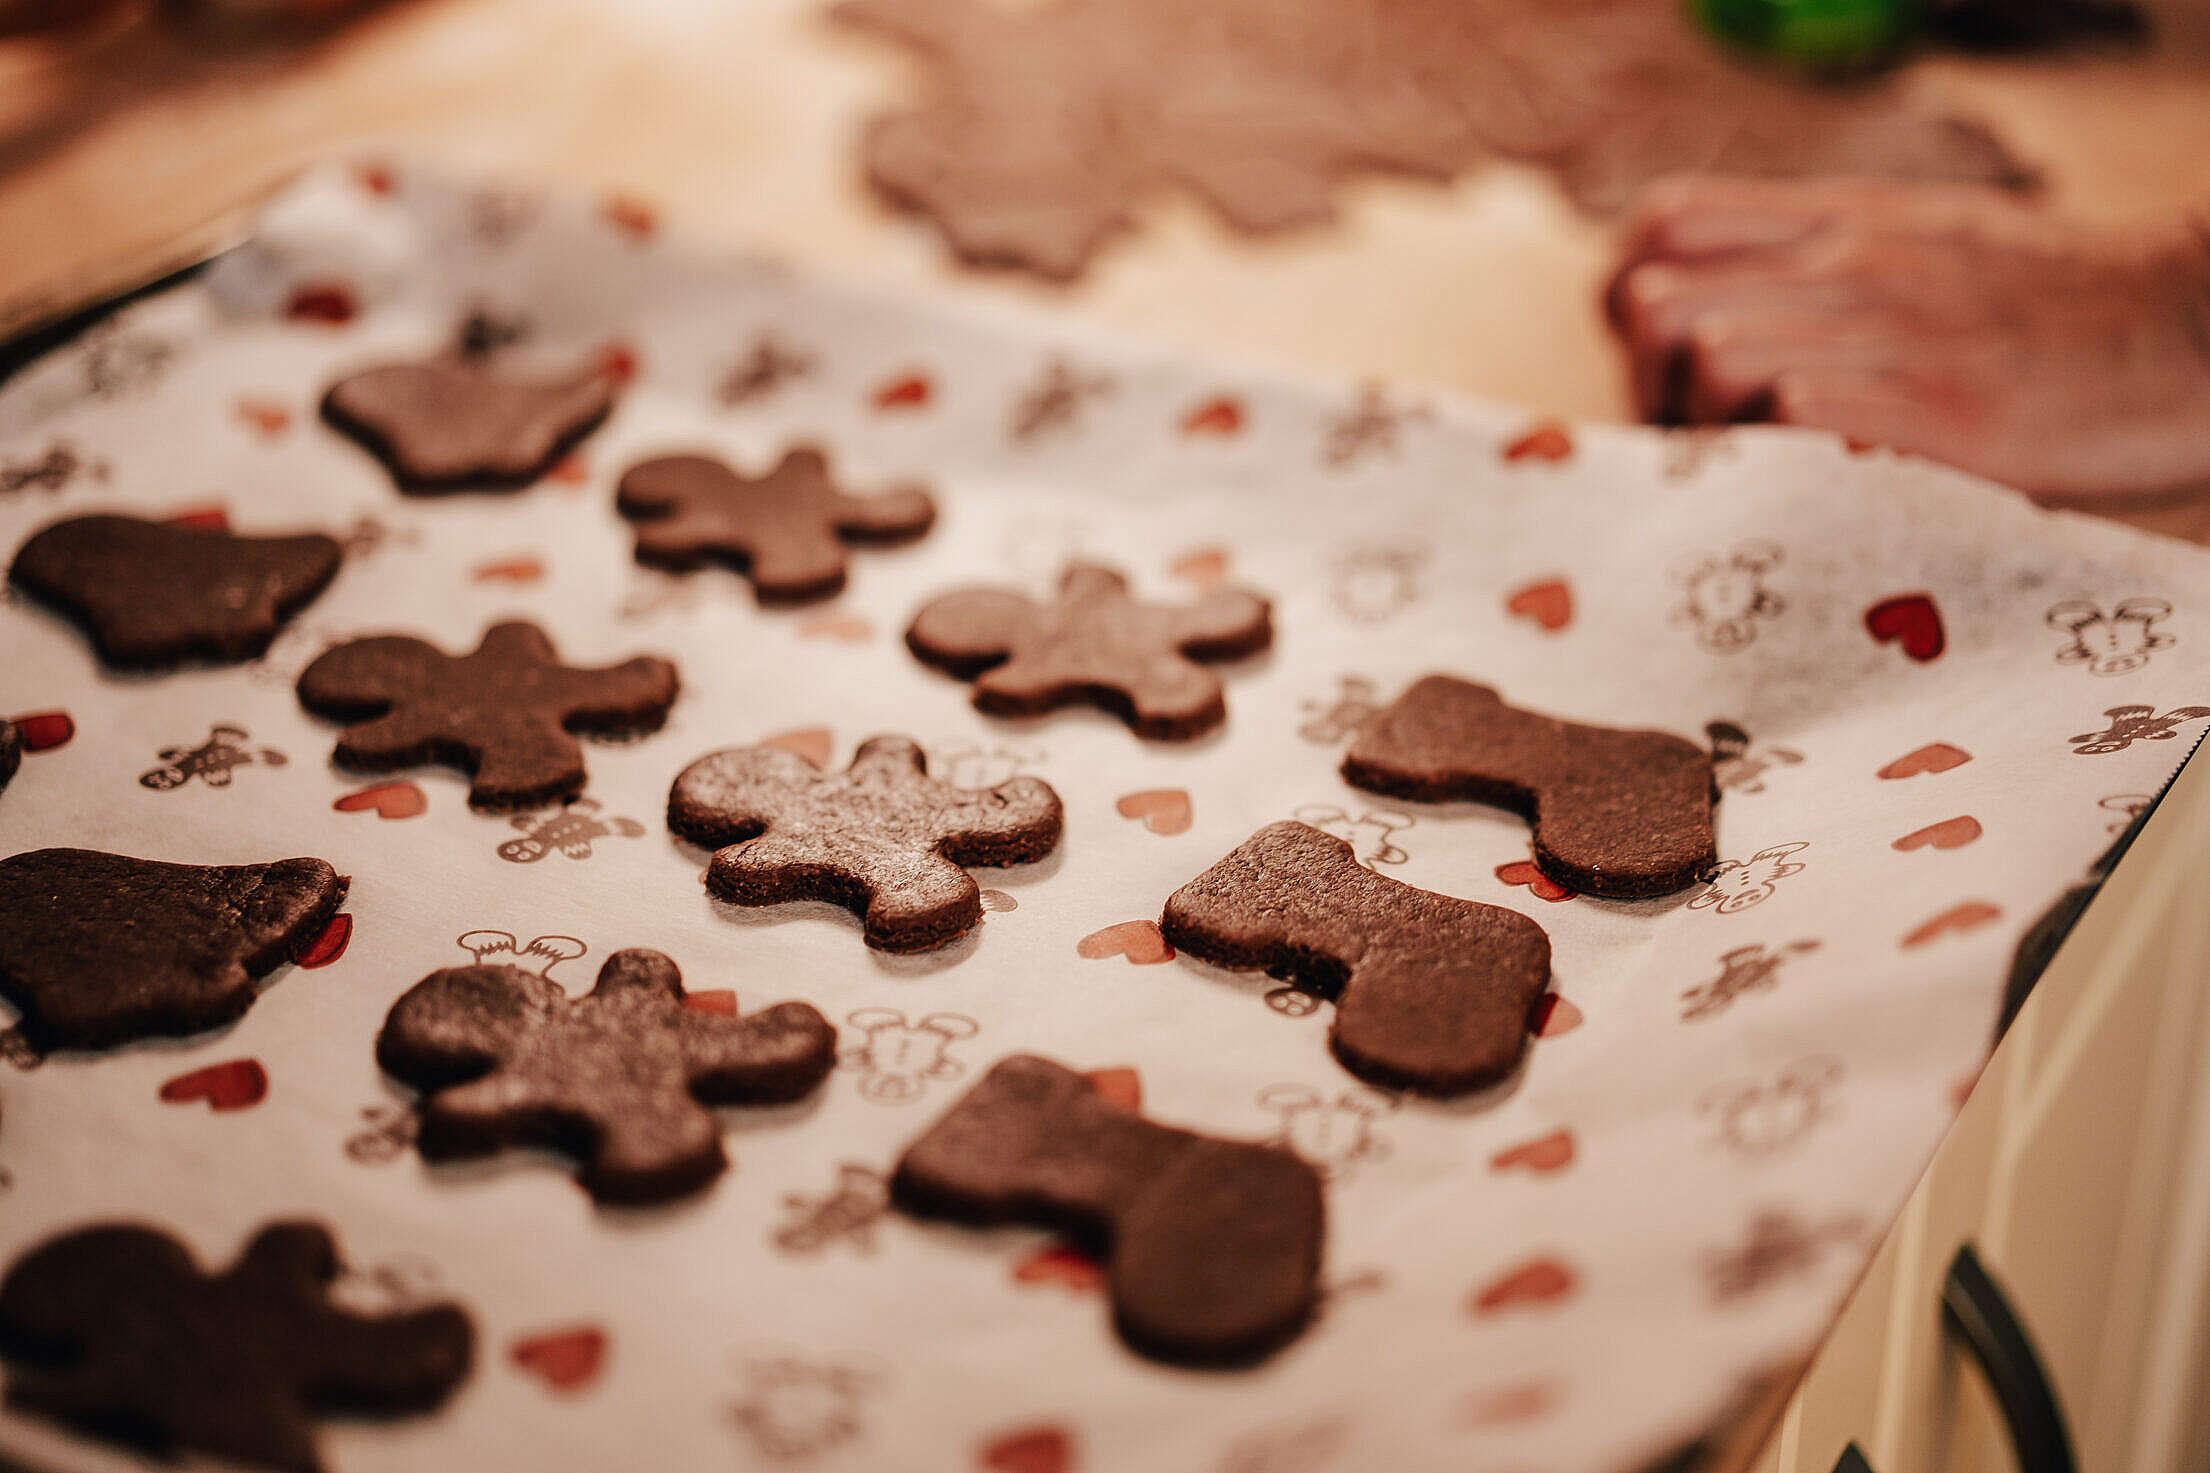 Baking Christmas Gingerbread Free Stock Photo